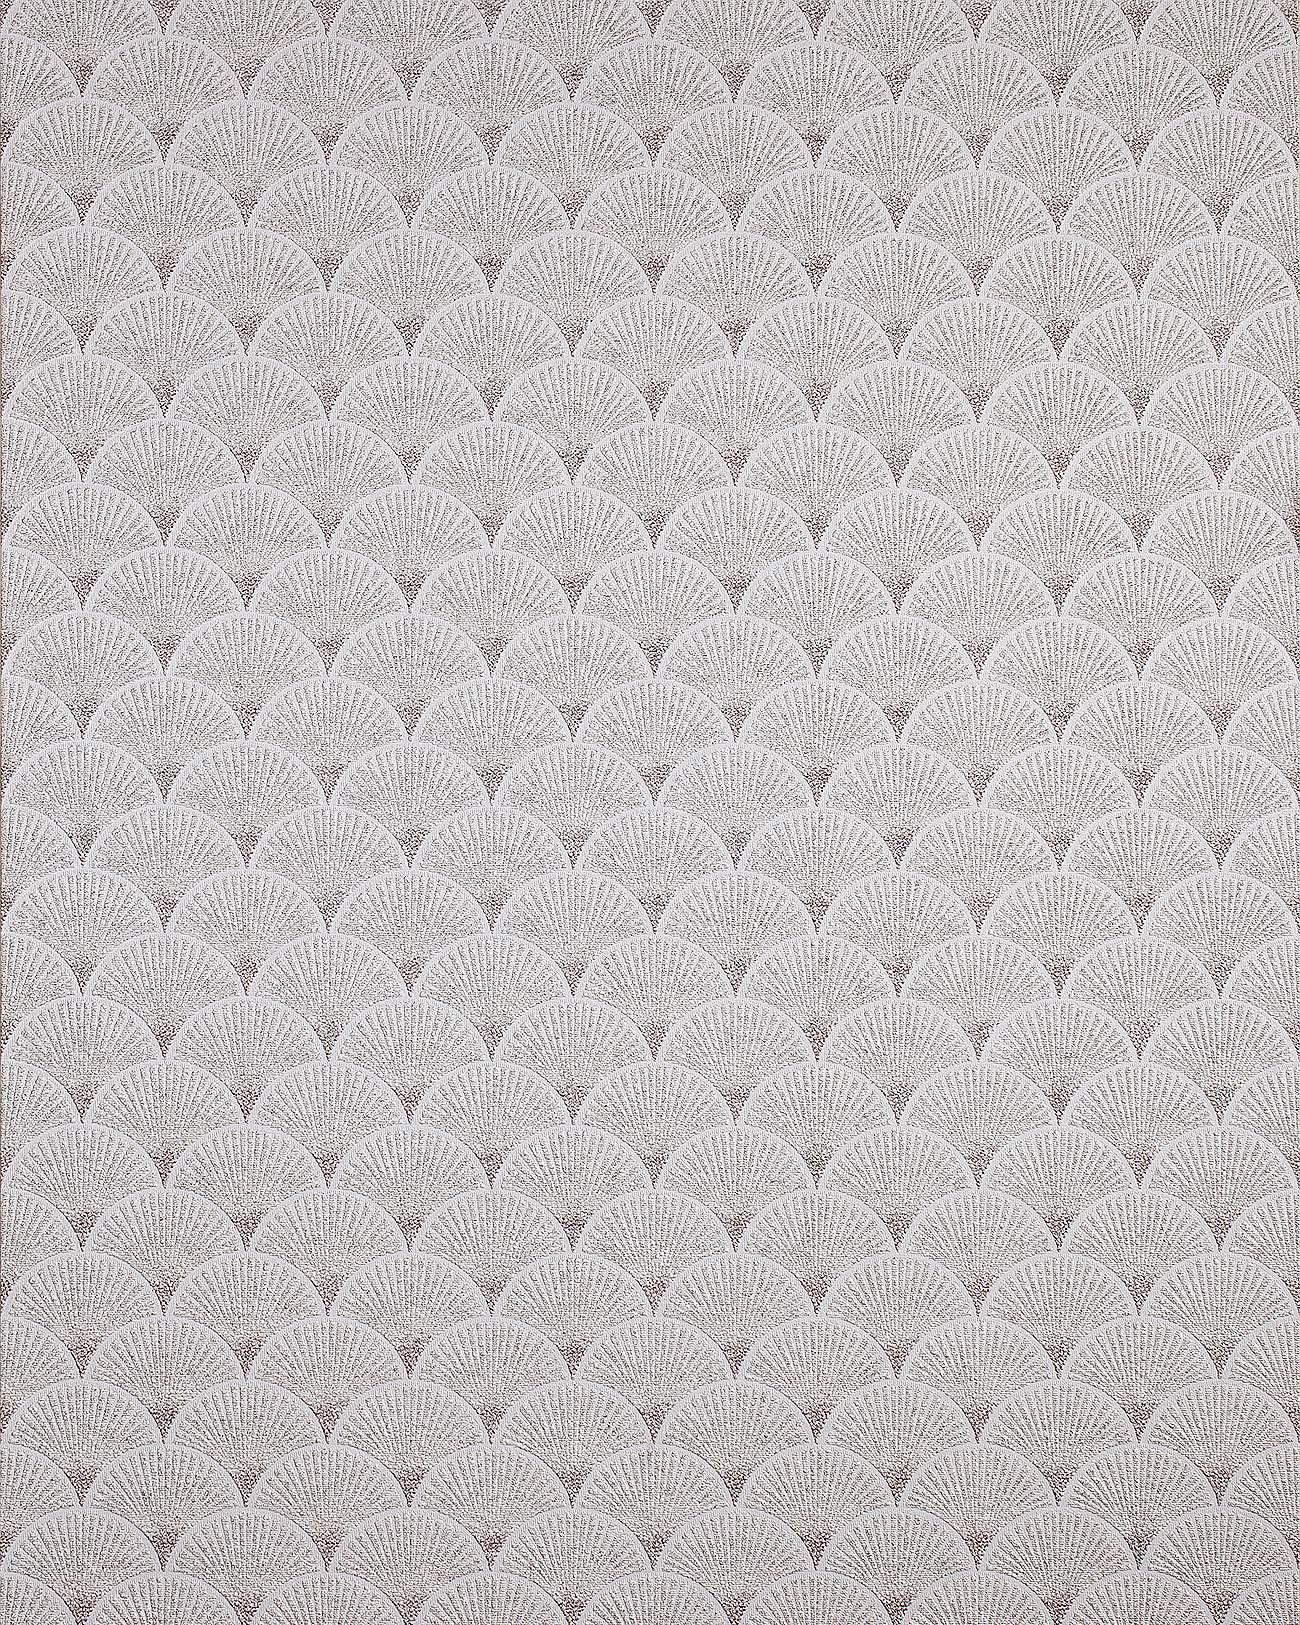 Retro tapete edem 1031 10 vinyltapete gepr gt mit for Tapete grau mit muster